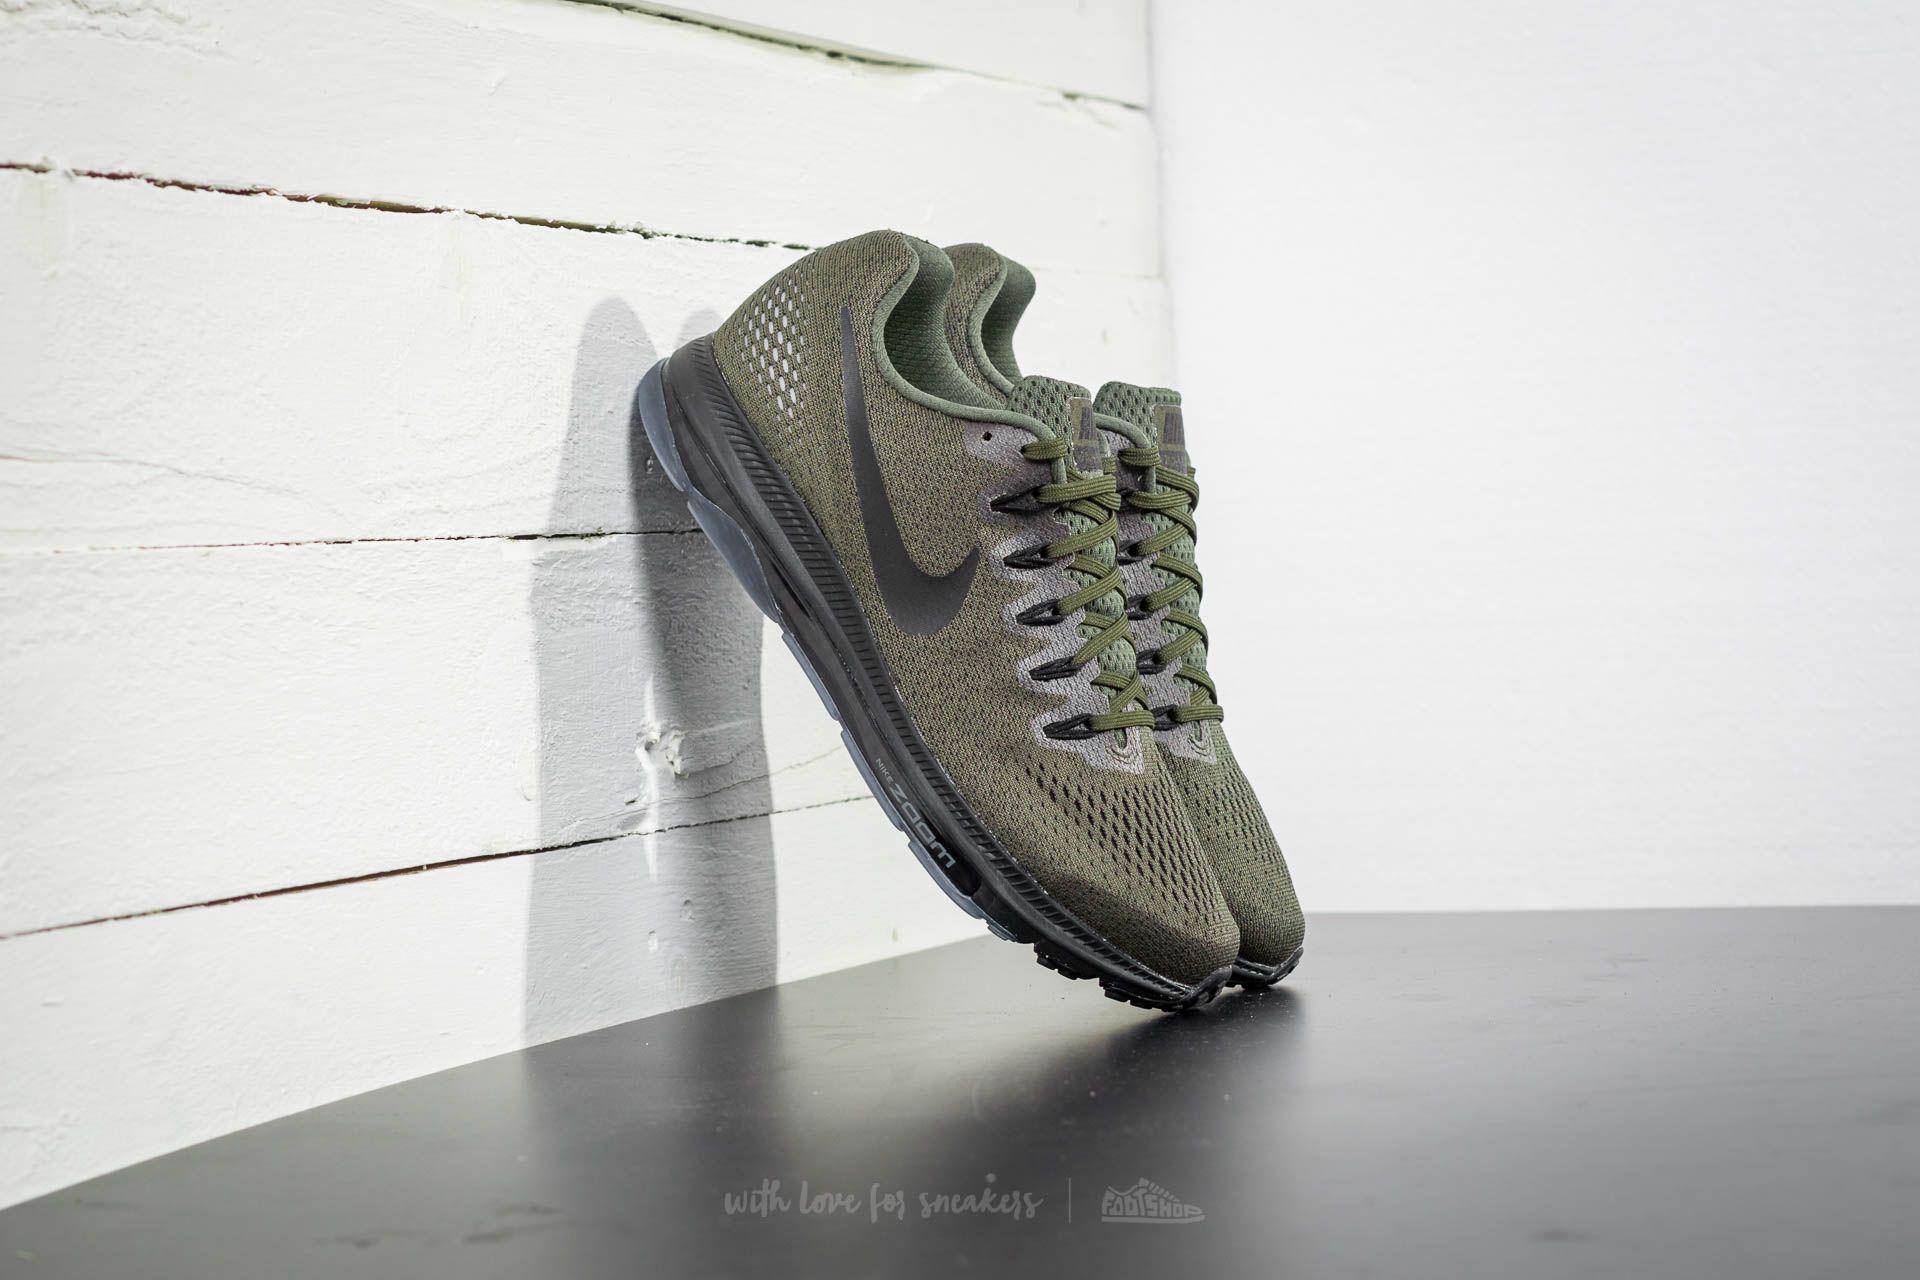 Vulgaridad adecuado Hora  Men's shoes Nike Zoom All Out Low Cargo Khaki/ Black | Footshop